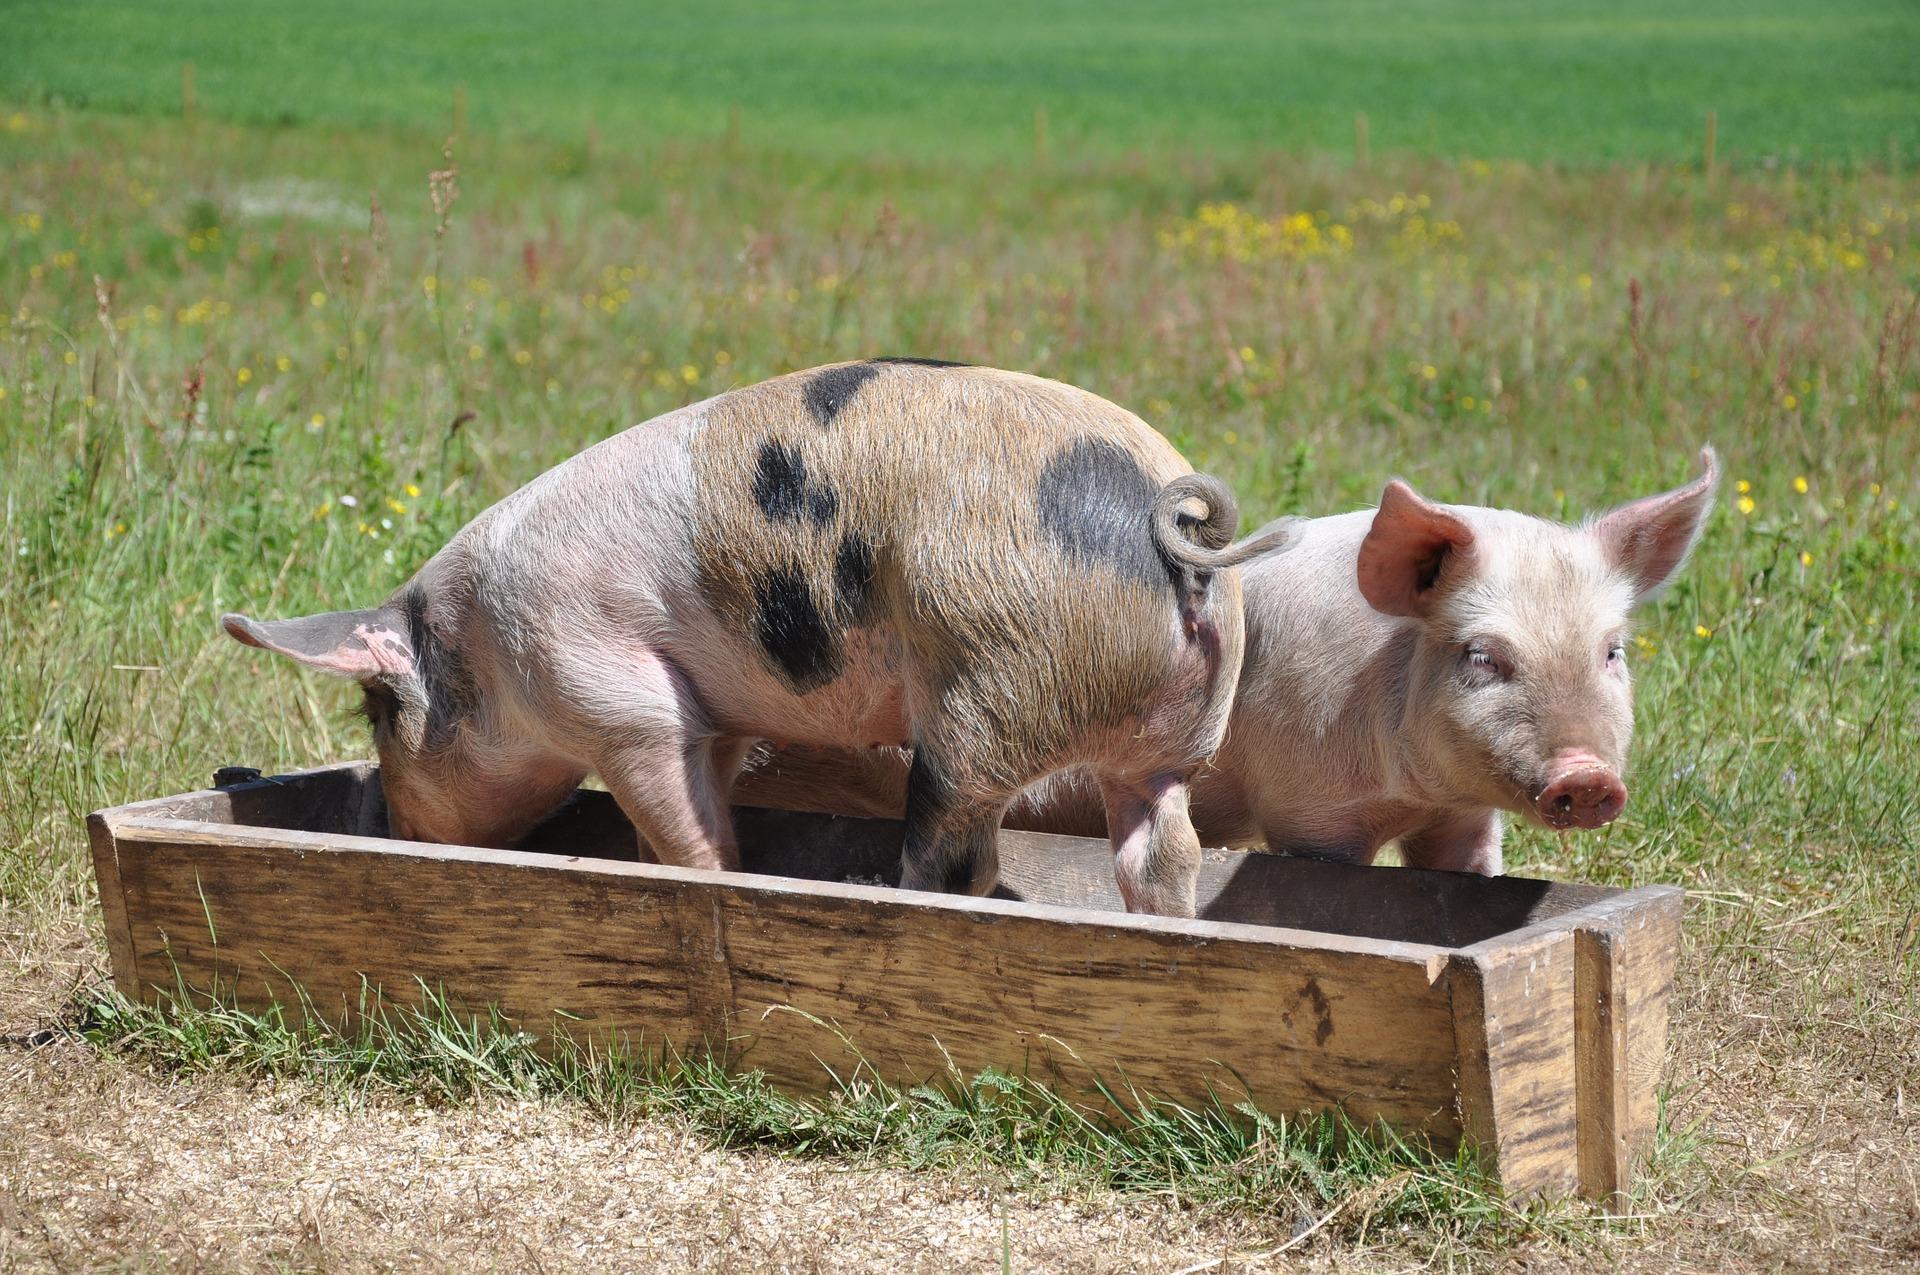 pigs-662001_1920 (1)